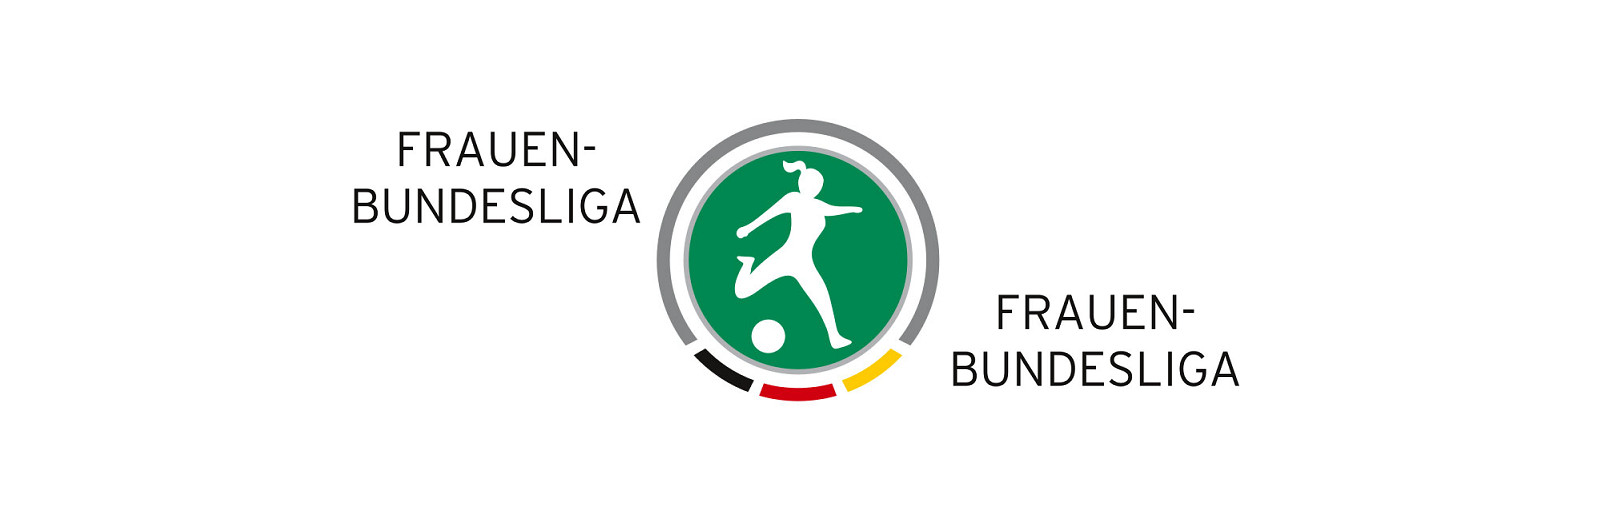 Frauen Bundesliga Tabelle